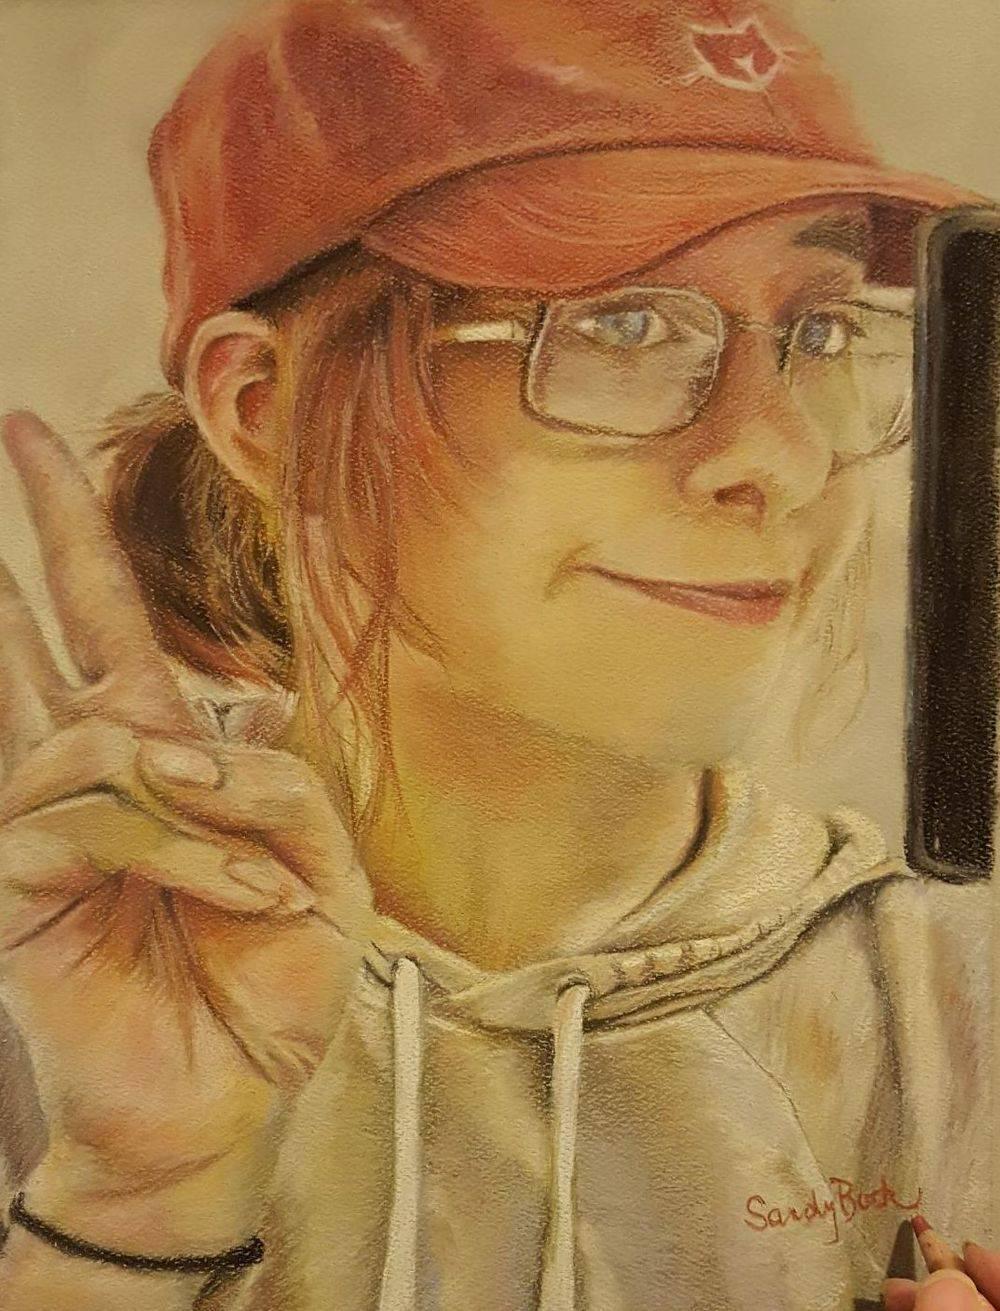 selfie, portrait, people, young woman portrait, art, sandy bock